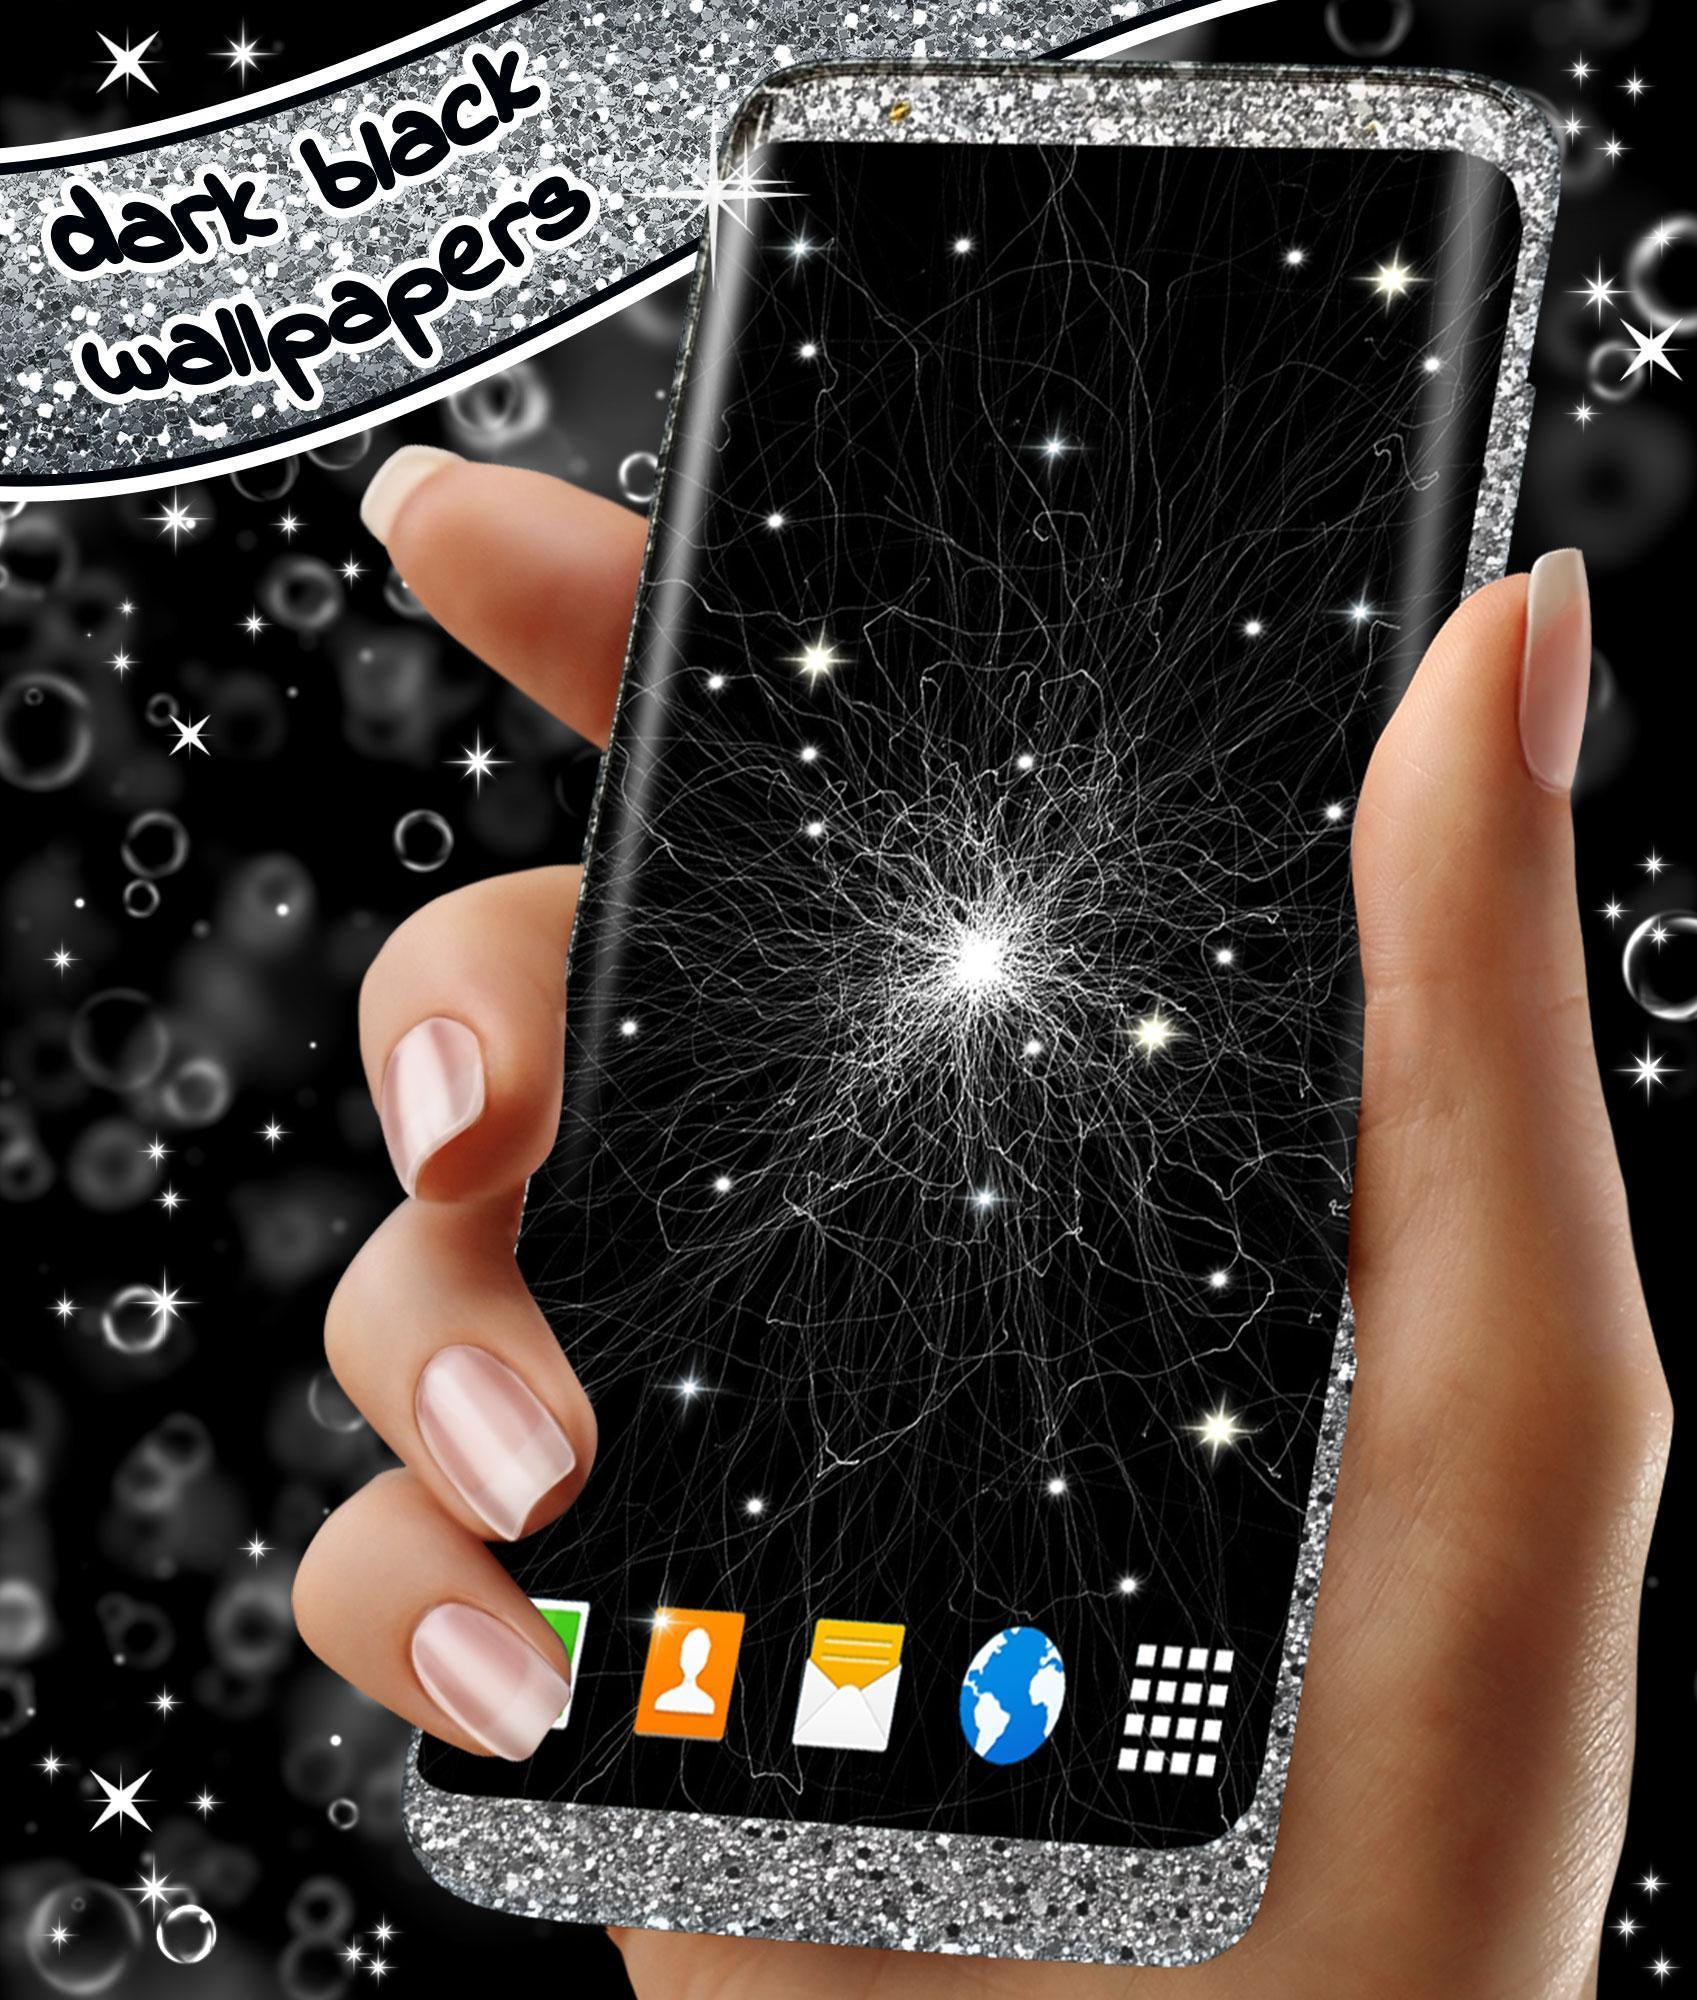 HD Black Live Wallpaper - Amoled Wallpaper Themes for ...